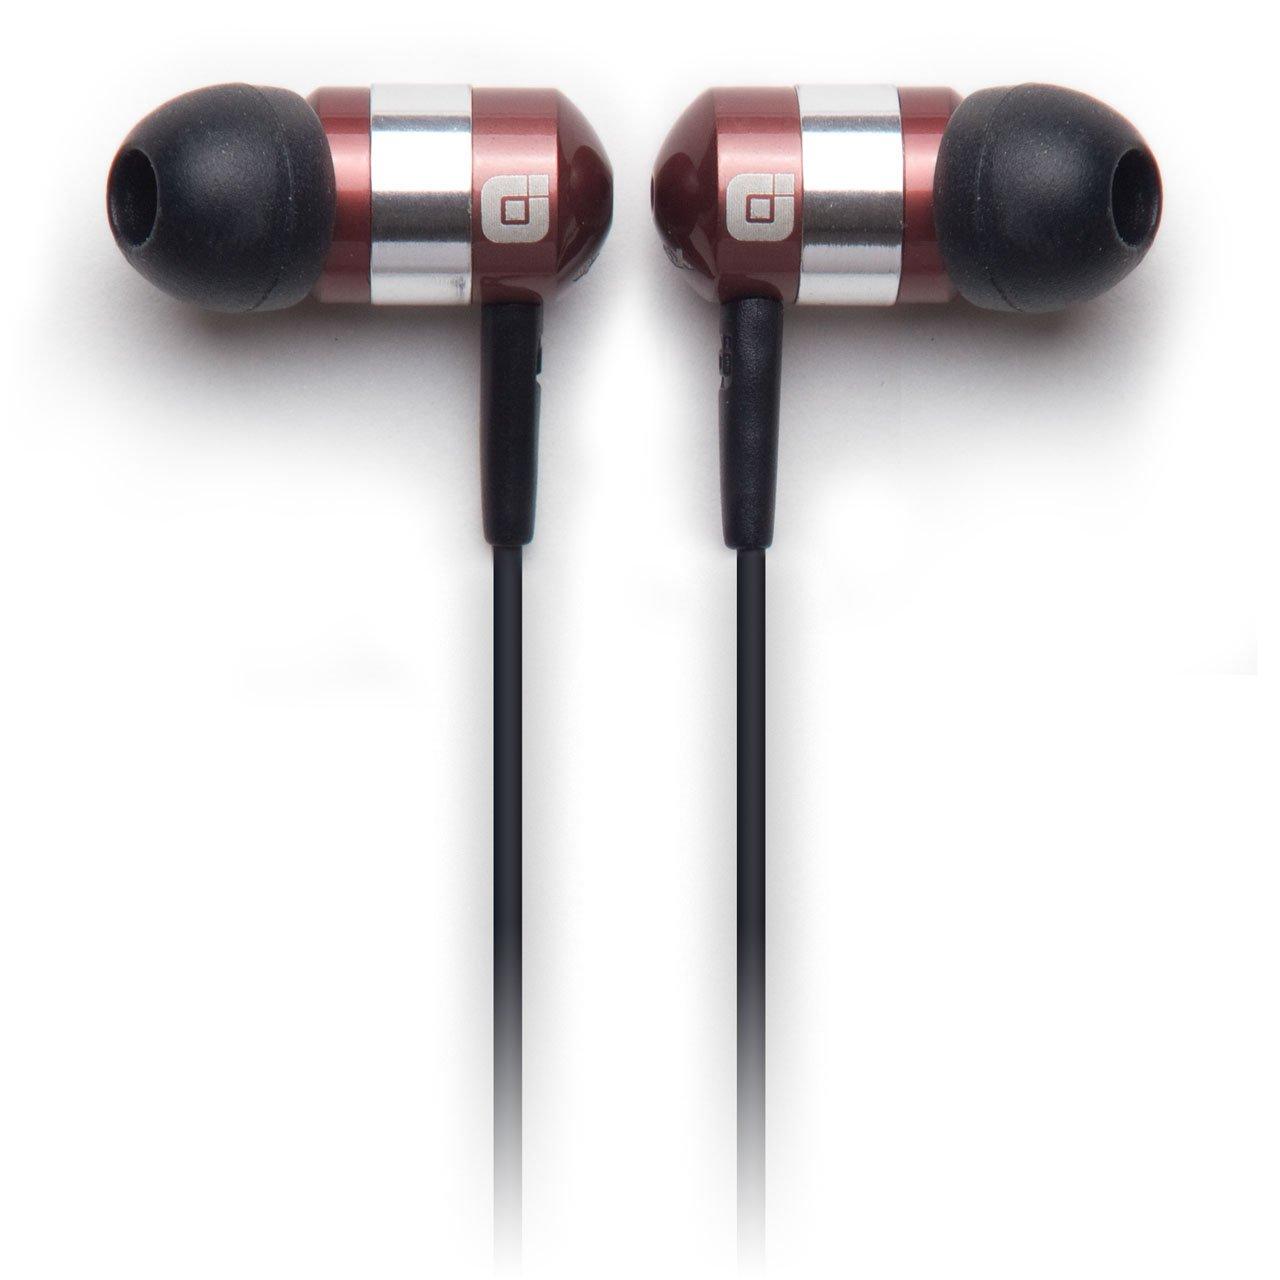 Earjax BZ-EMY64-0611M Moxy Series Headphones with Inline Mic, Brown Silver